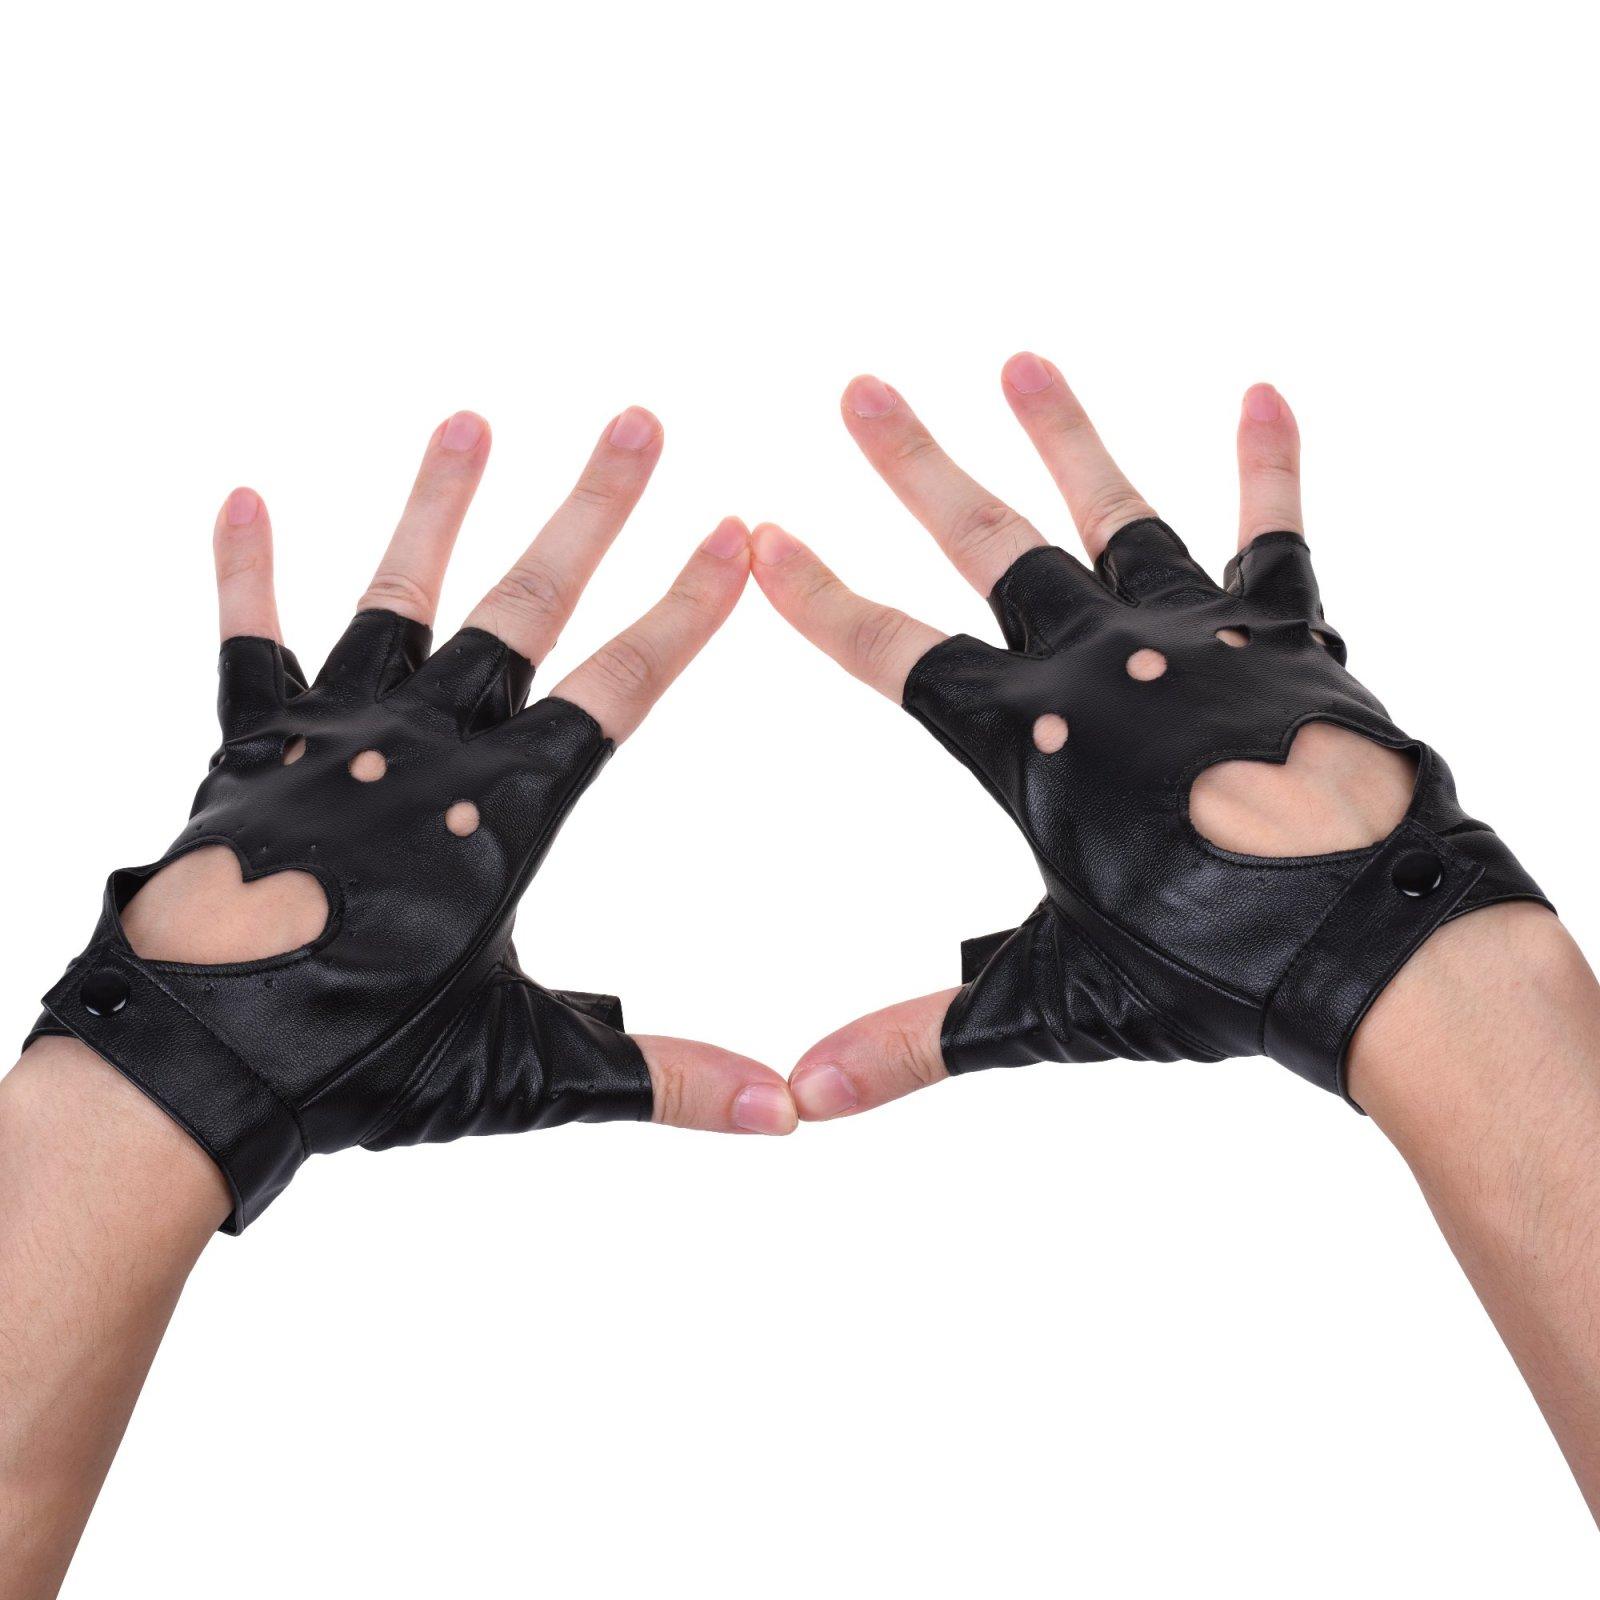 Ladies unlined leather driving gloves - Genuine Leather Women Ladies Girls Unlined Driving Gloves Fingerless Snug Fit